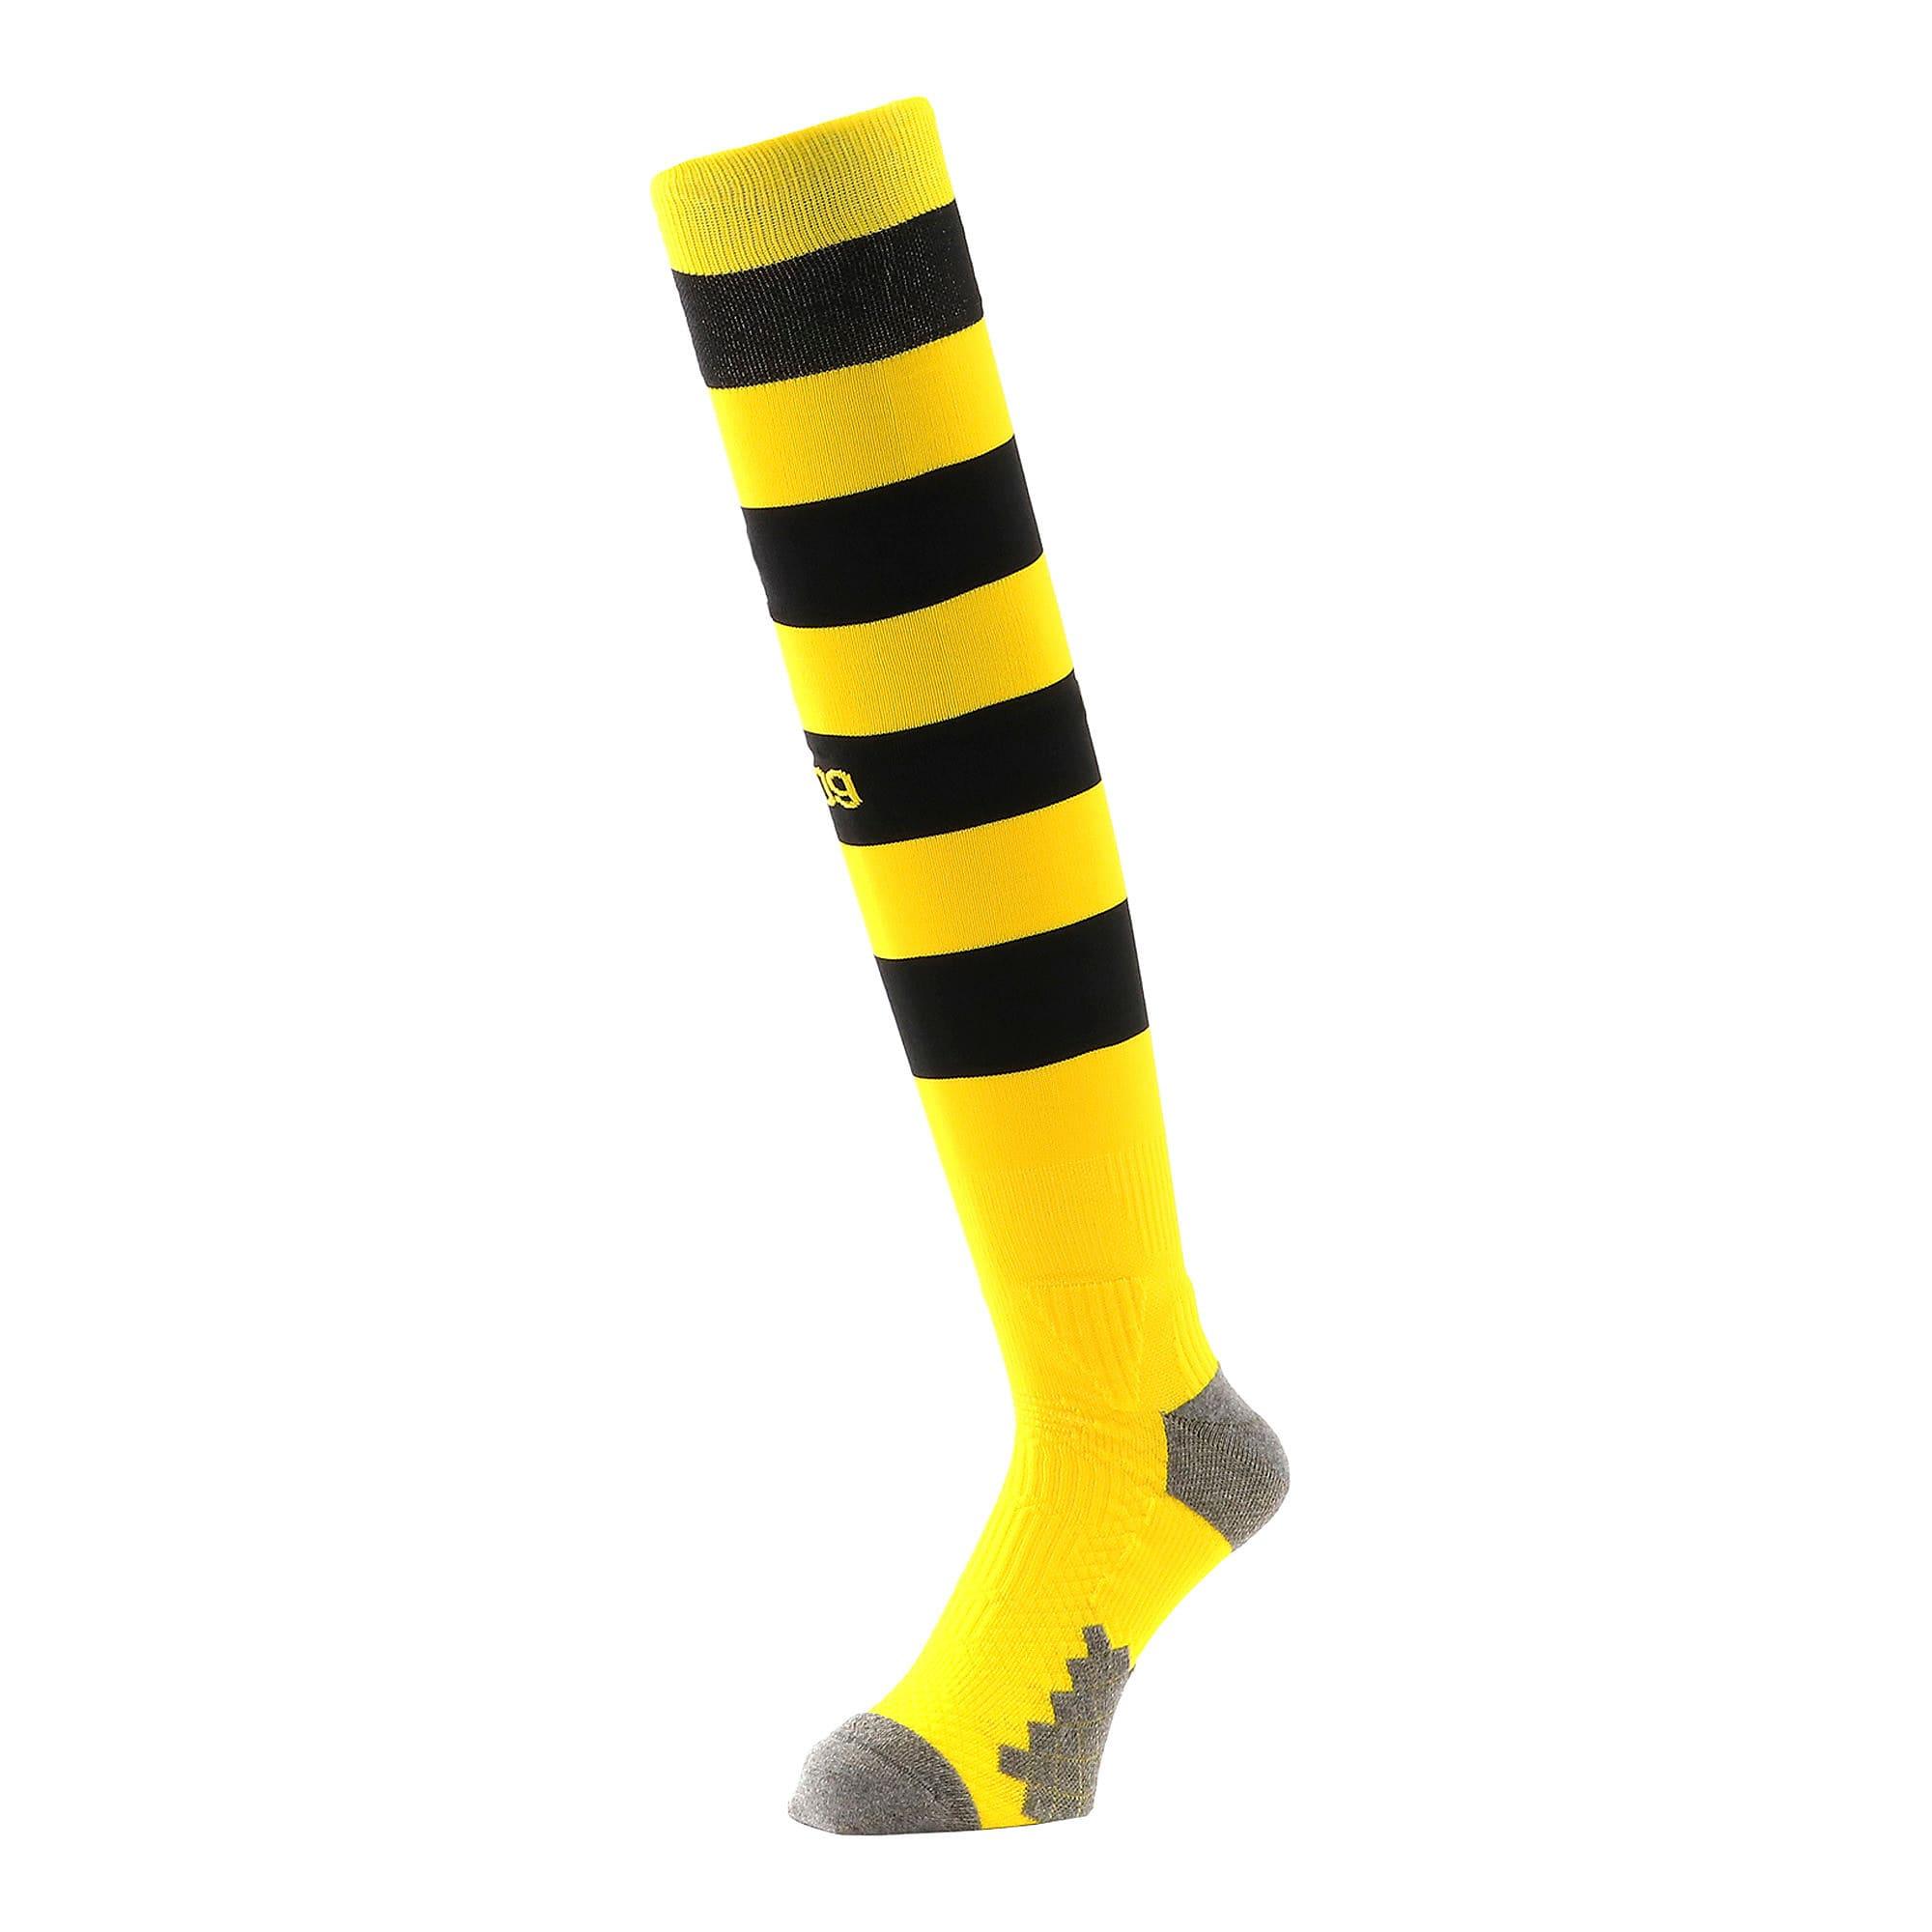 Thumbnail 1 of BVB フープド ストッキング, Cyber Yellow-Puma Black, medium-JPN